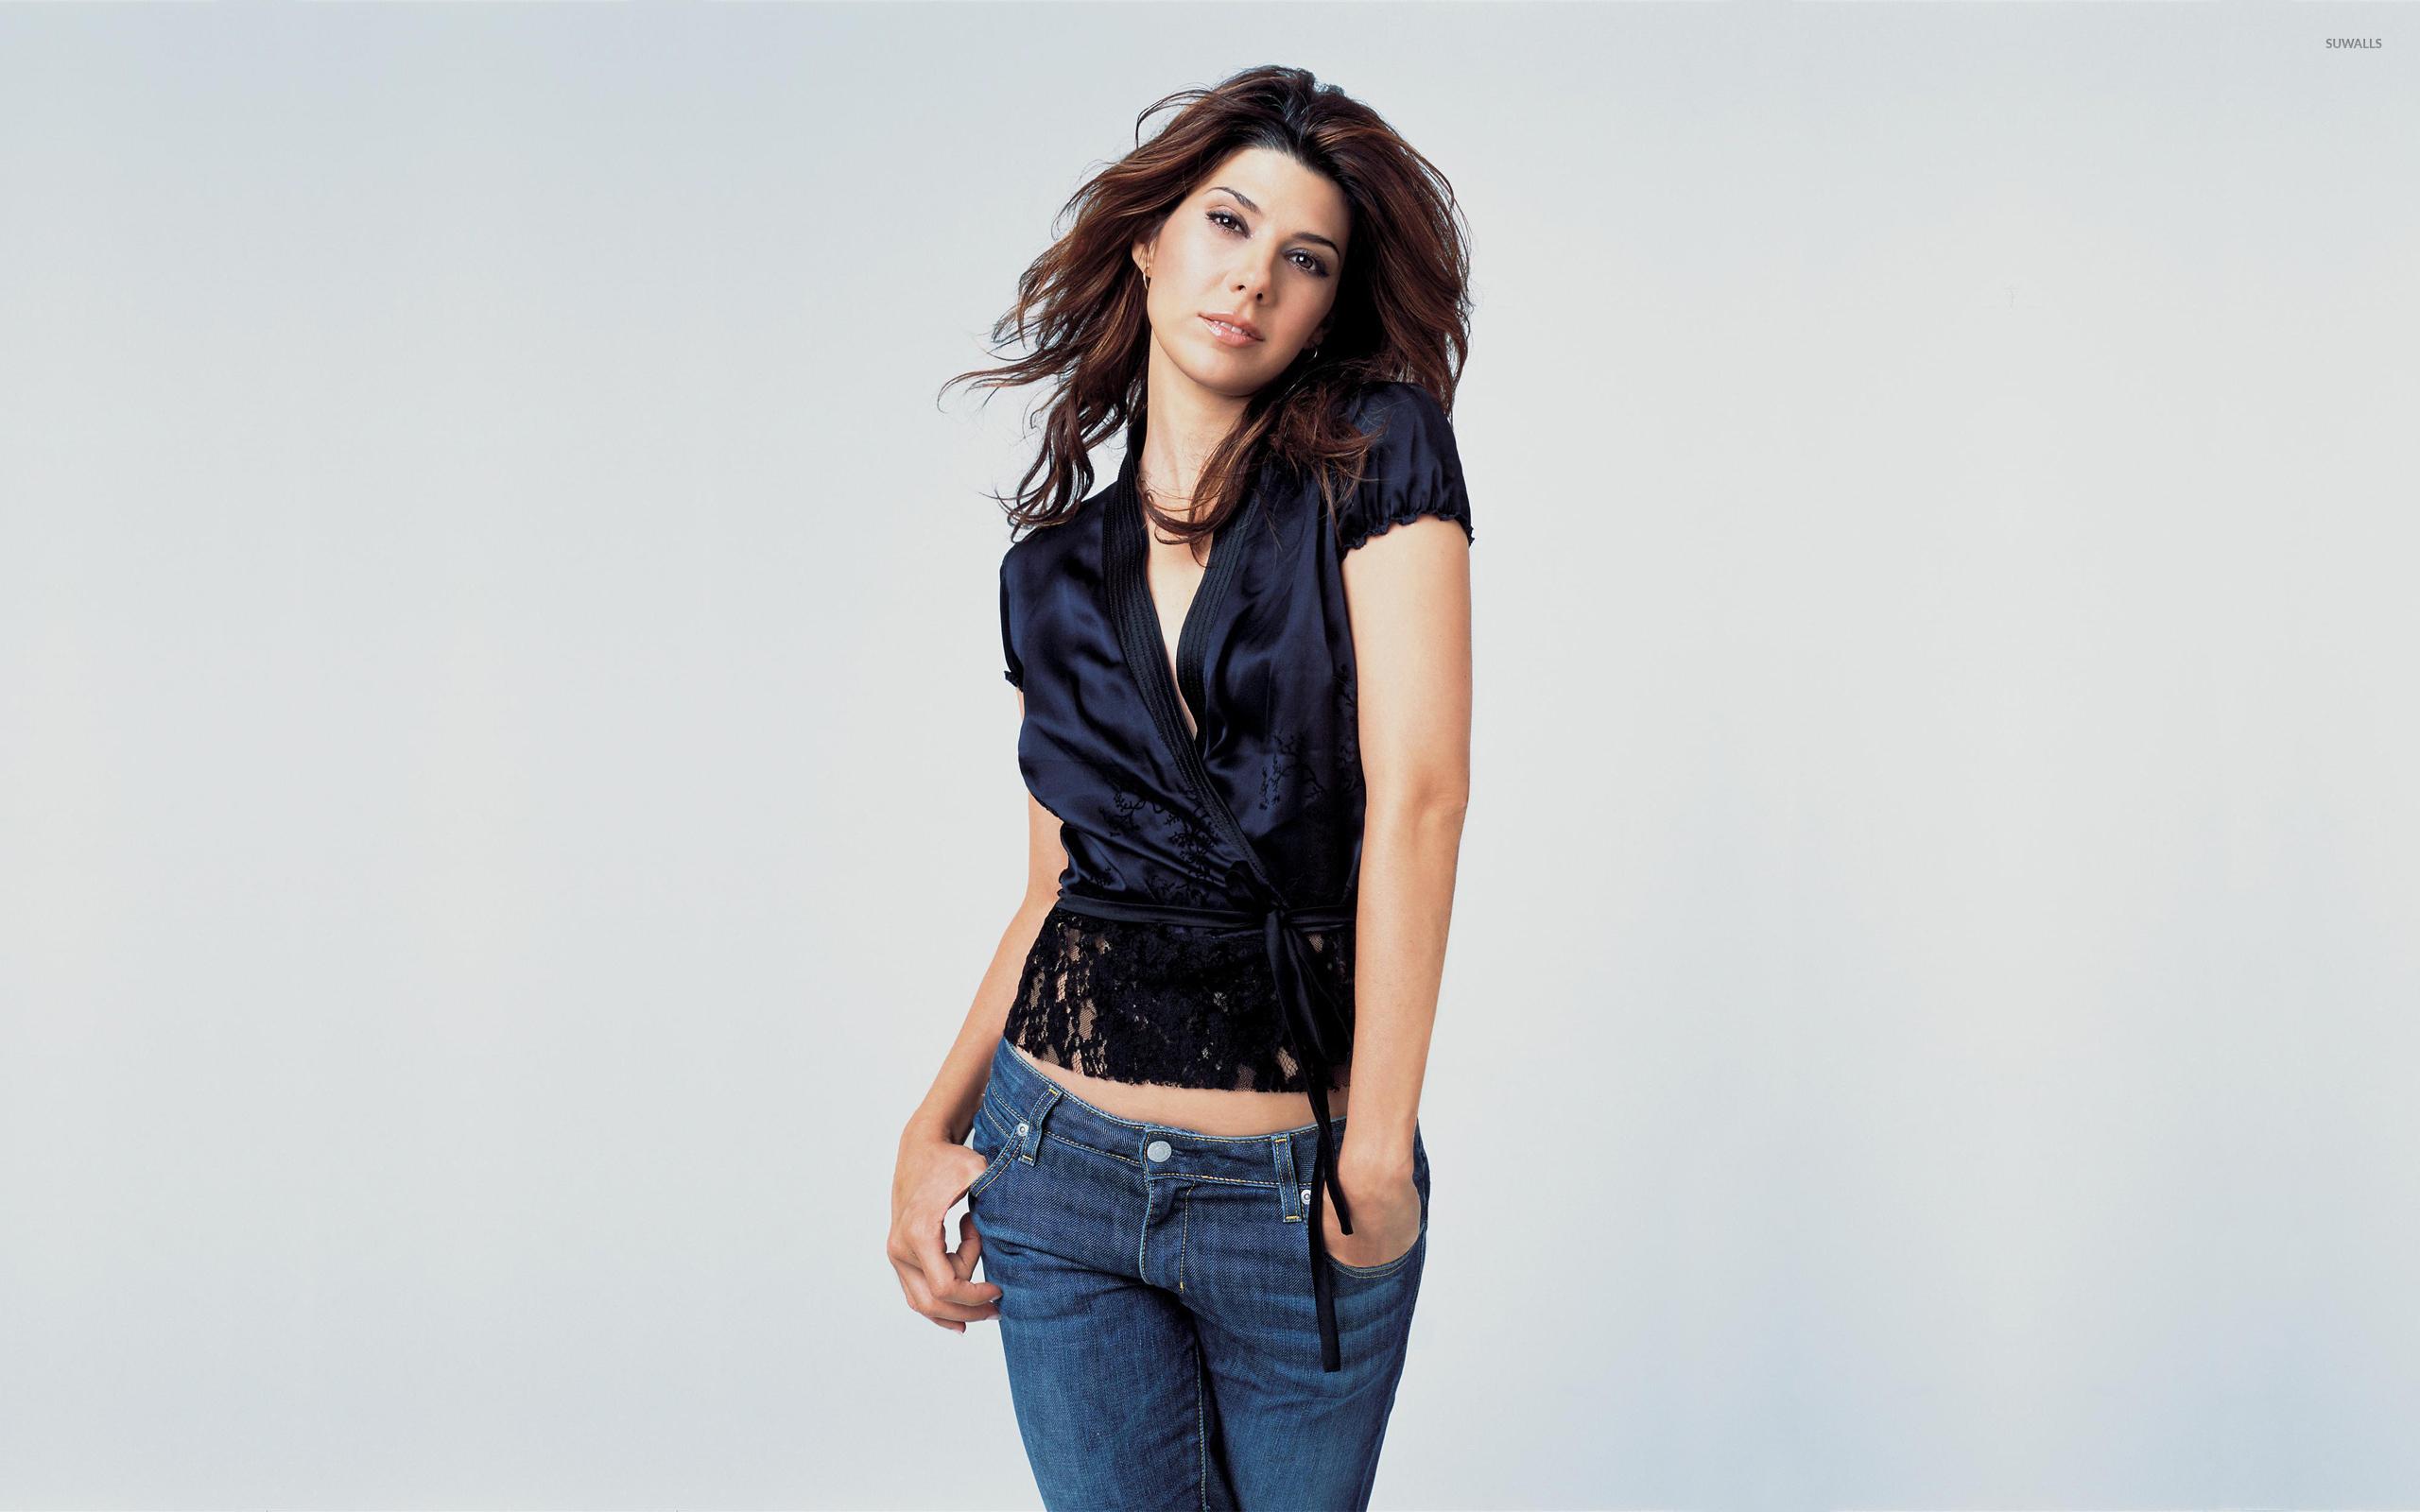 Marisa Tomei Wallpaper 4   2560 X 1600 stmednet 2560x1600